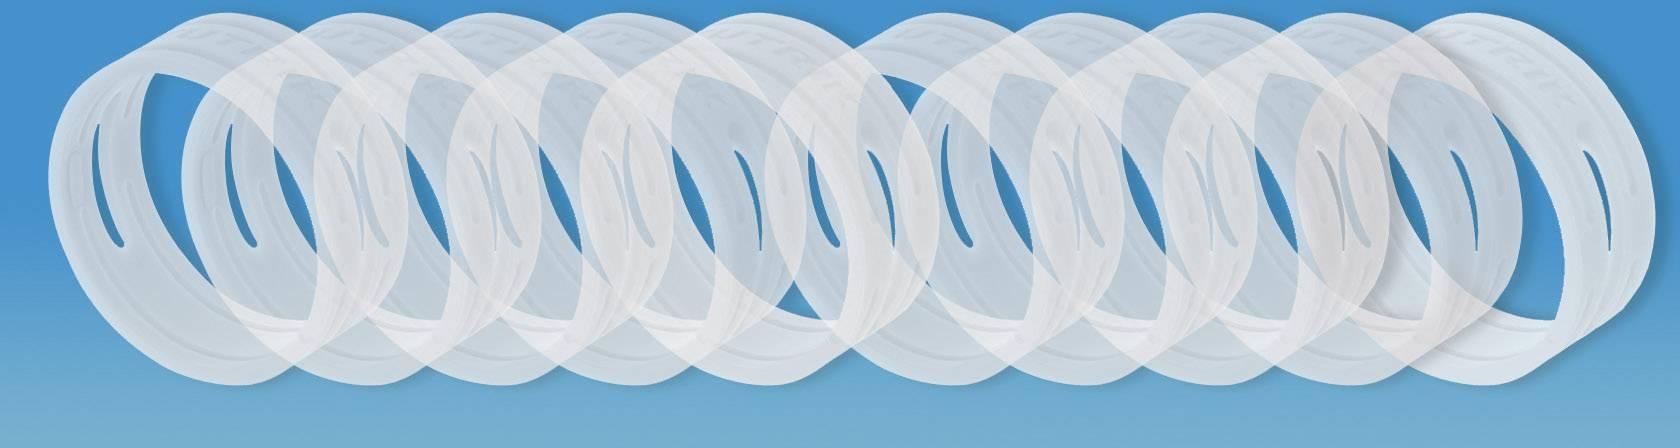 Kódovací krúžok Neutrik XXCR-SET-TRANSPARENT, priehľadná, 10 ks